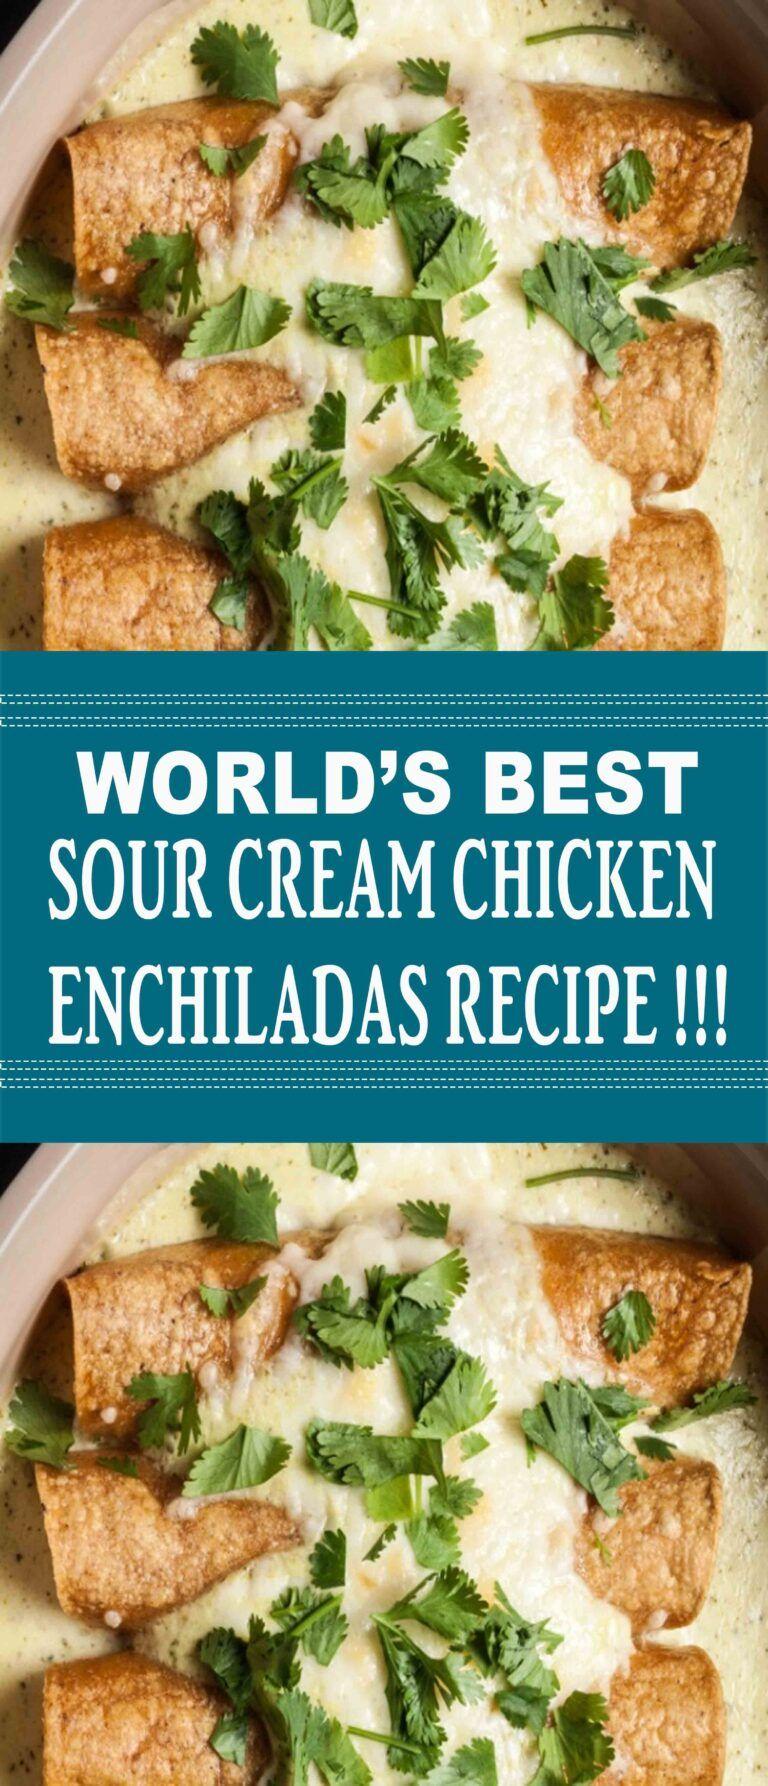 Sour Cream Chicken Enchiladas Recipe In 2020 Sour Cream Chicken Enchilada Recipe Sour Cream Chicken Enchilada Recipes